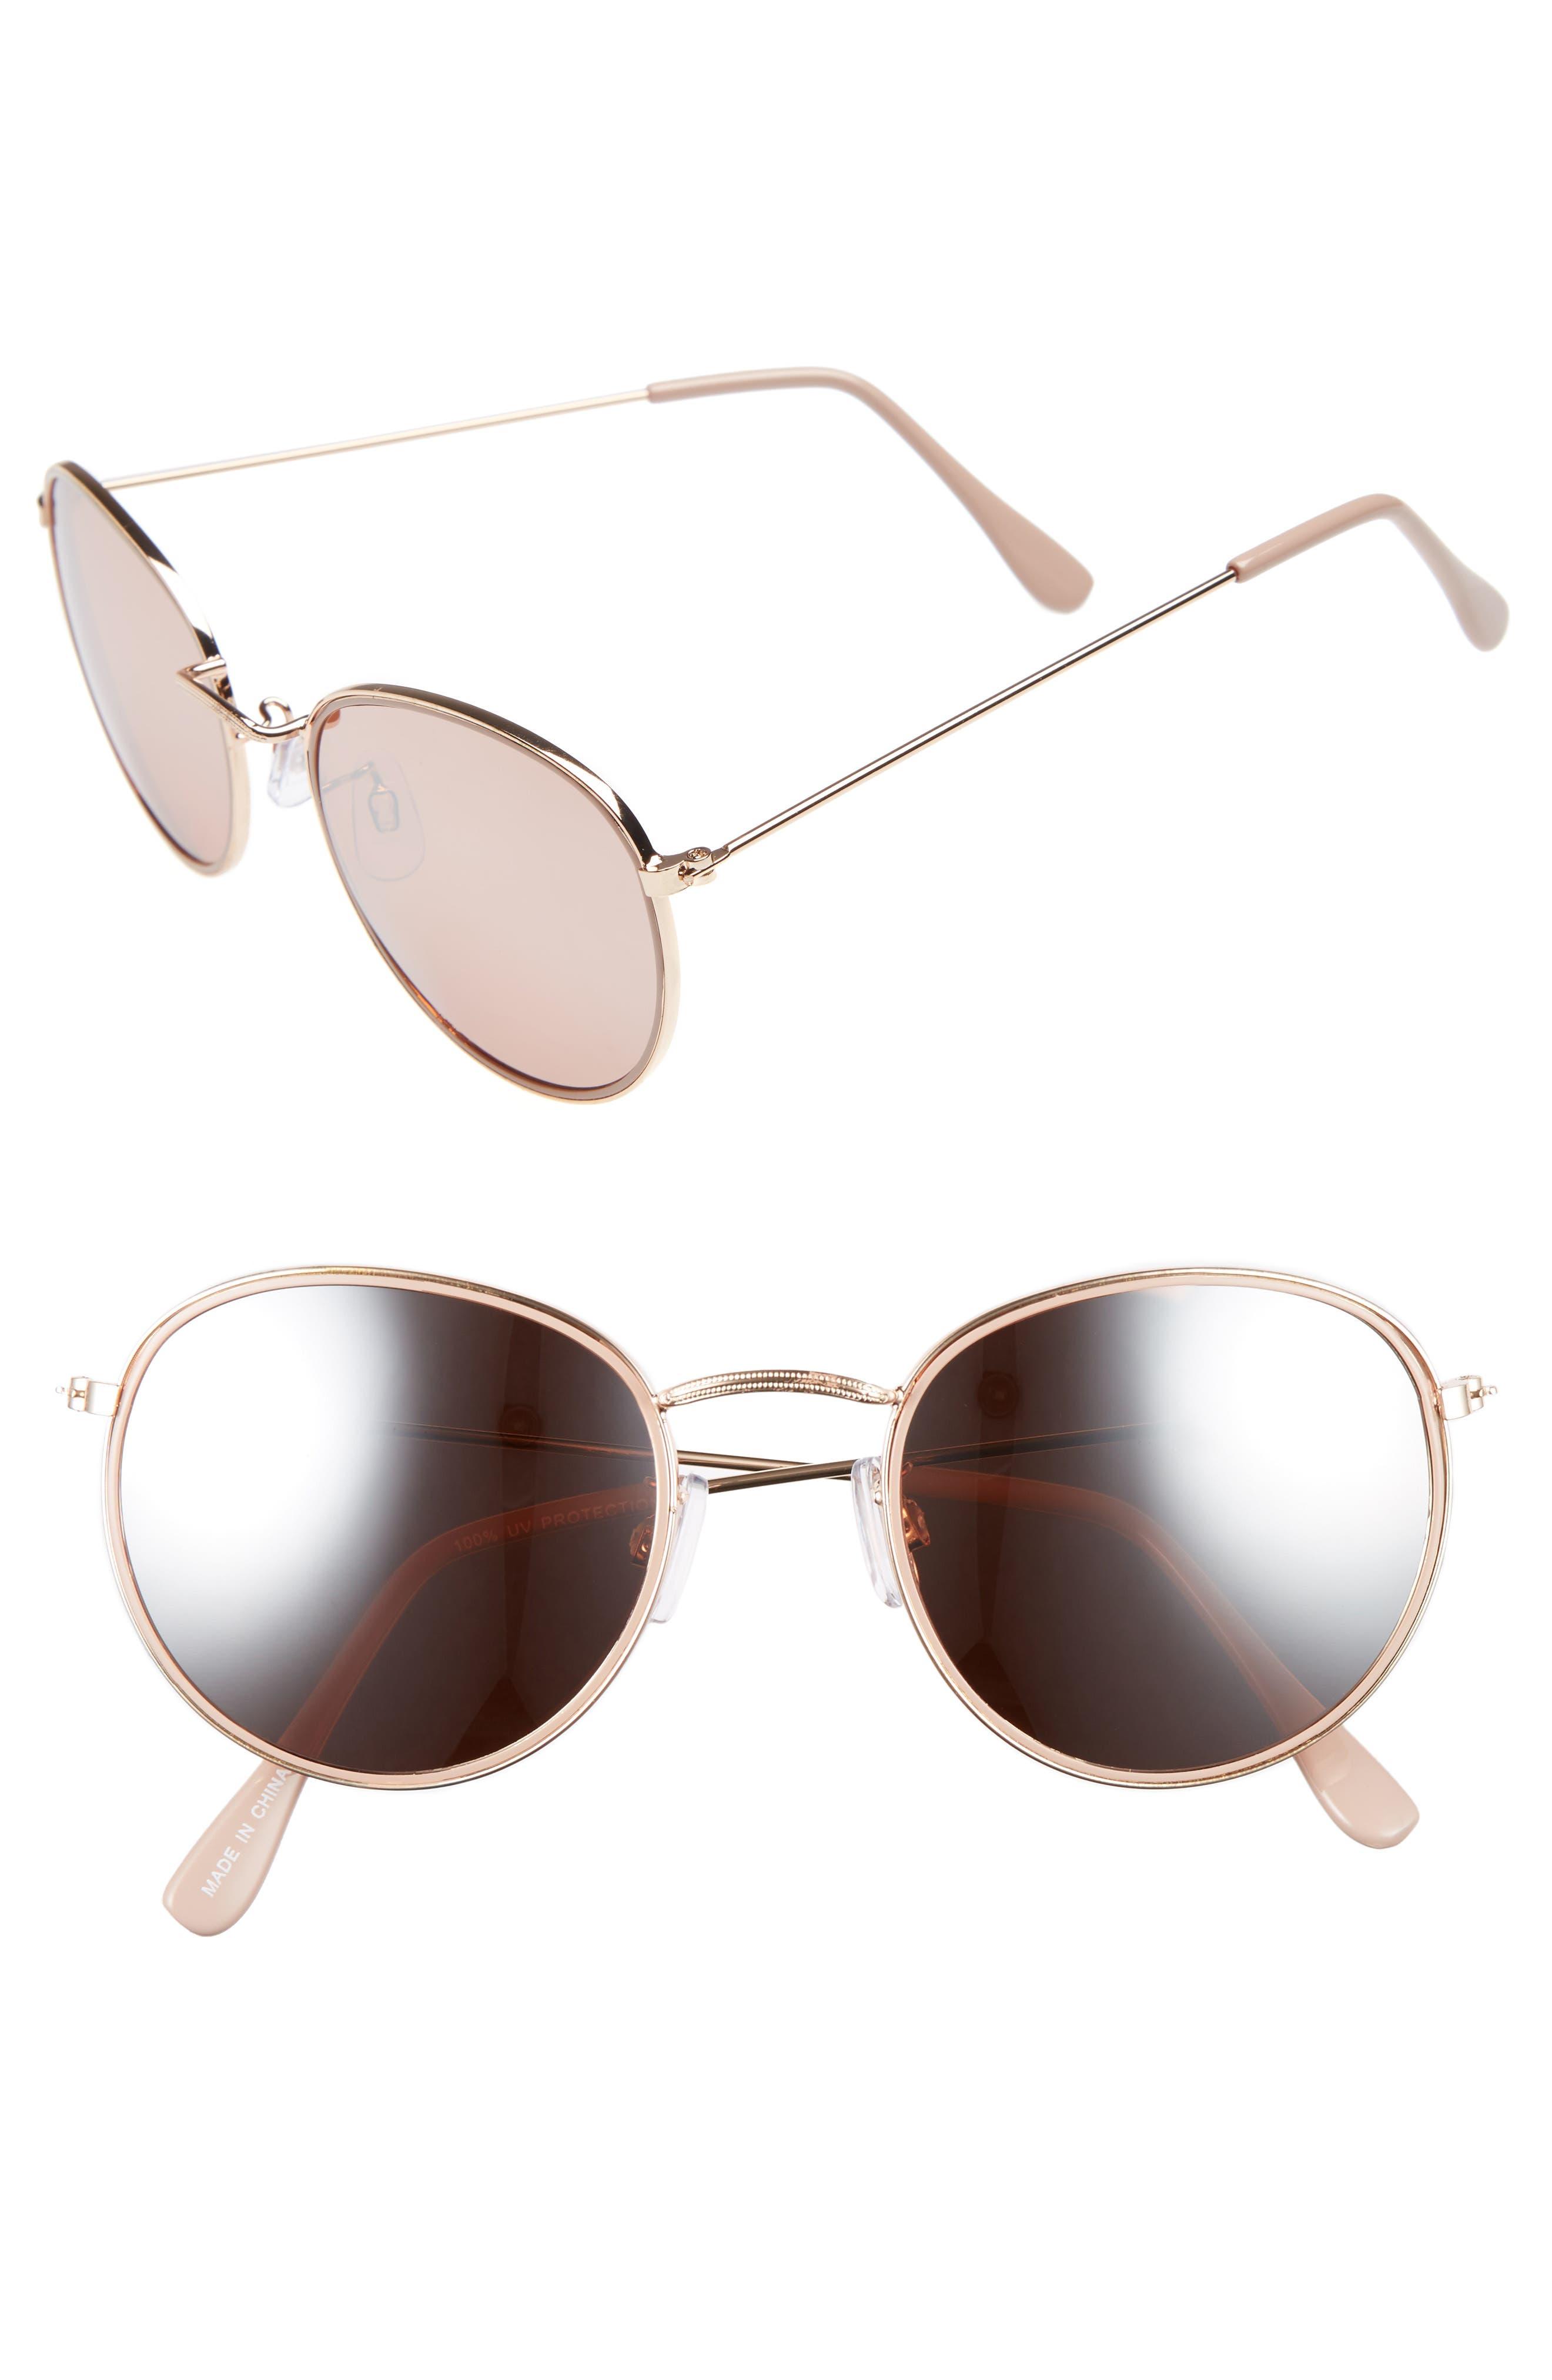 50mm Round Aviator Sunglasses,                         Main,                         color, Rose Gold